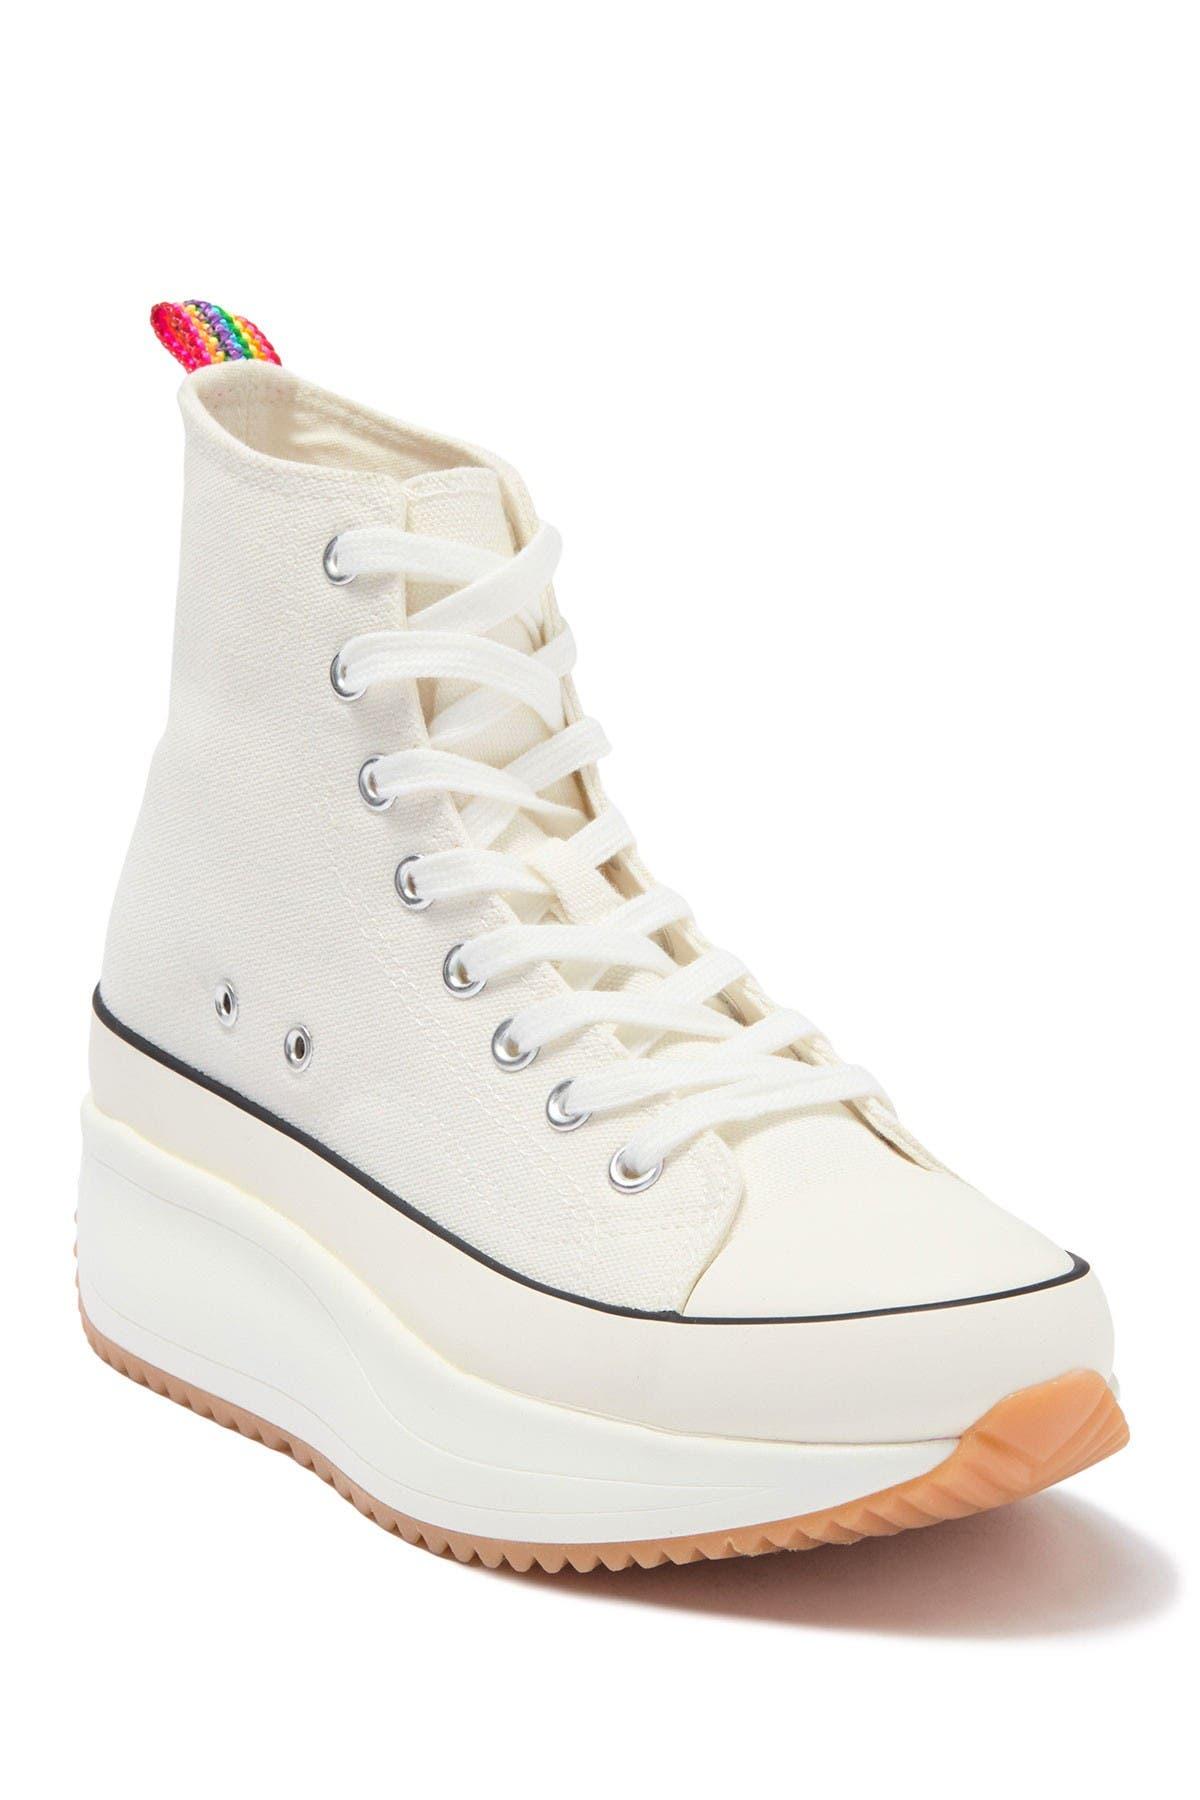 Image of Madden Girl Winnona Lace-Up Platform Sneaker